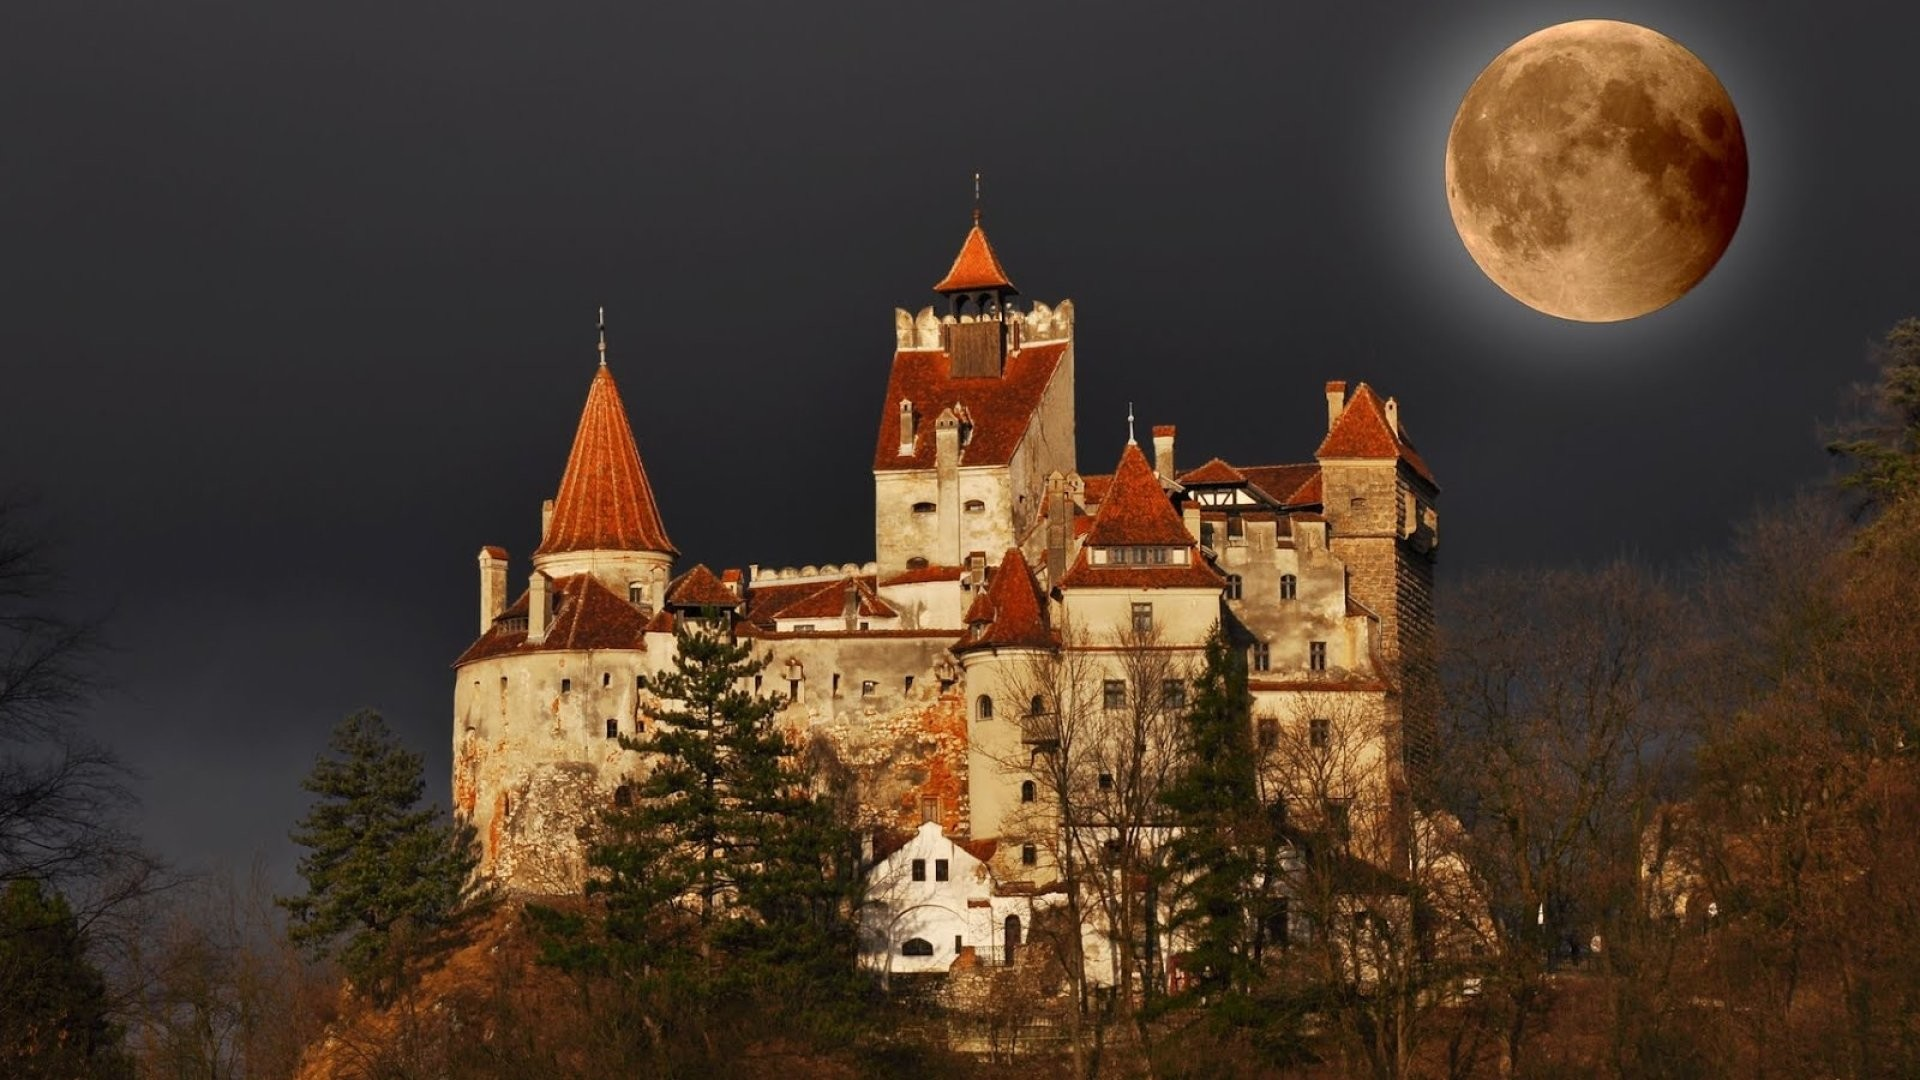 Res: 1920x1080, dracula castle